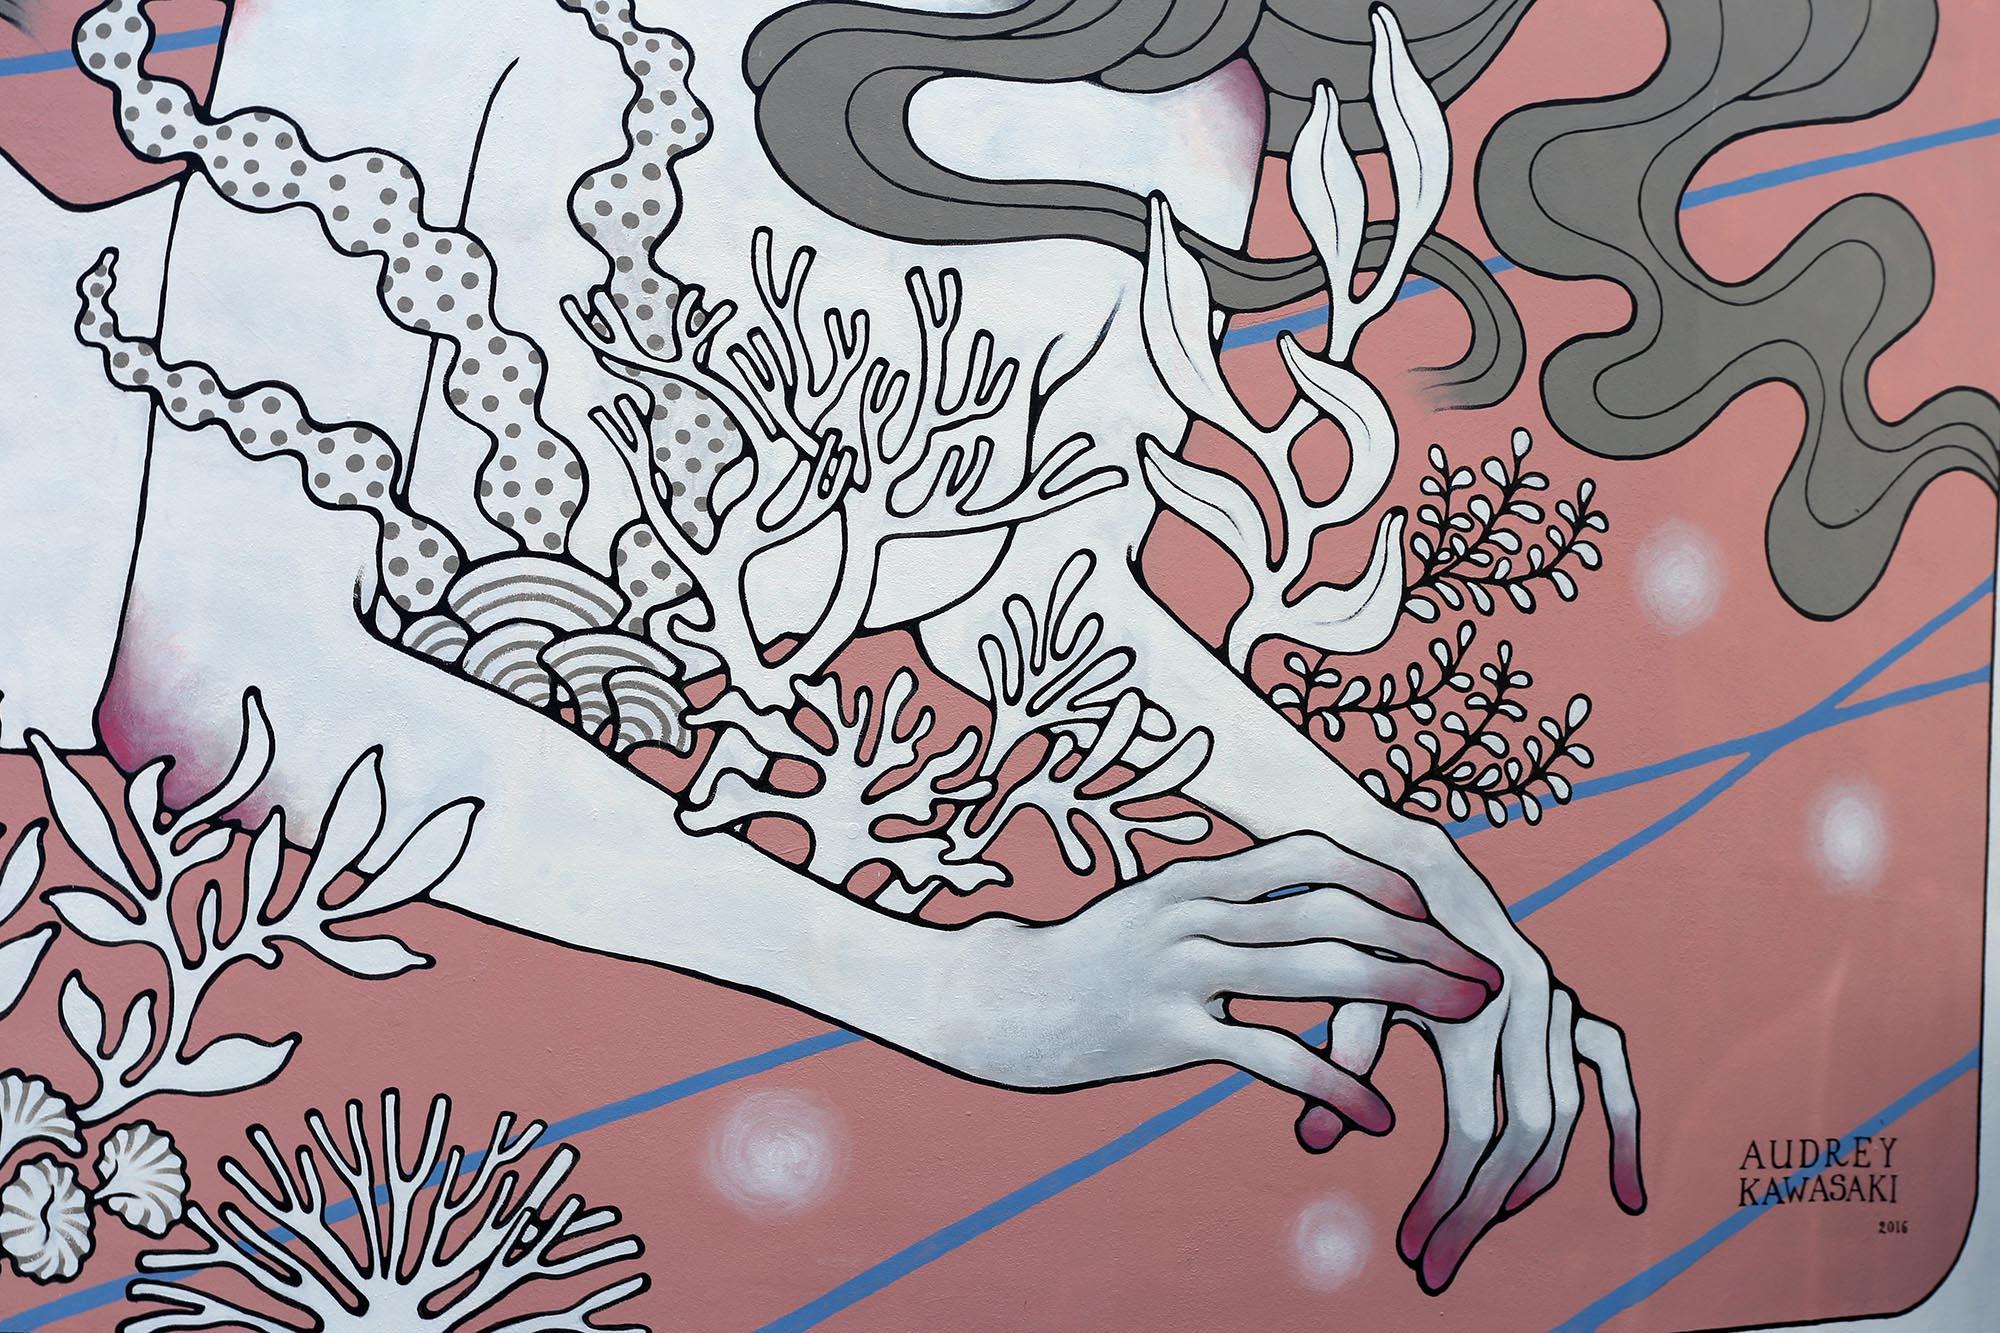 audrey_kawasaki_powwow-festival-grafite-mural-dionisio-arte (6)